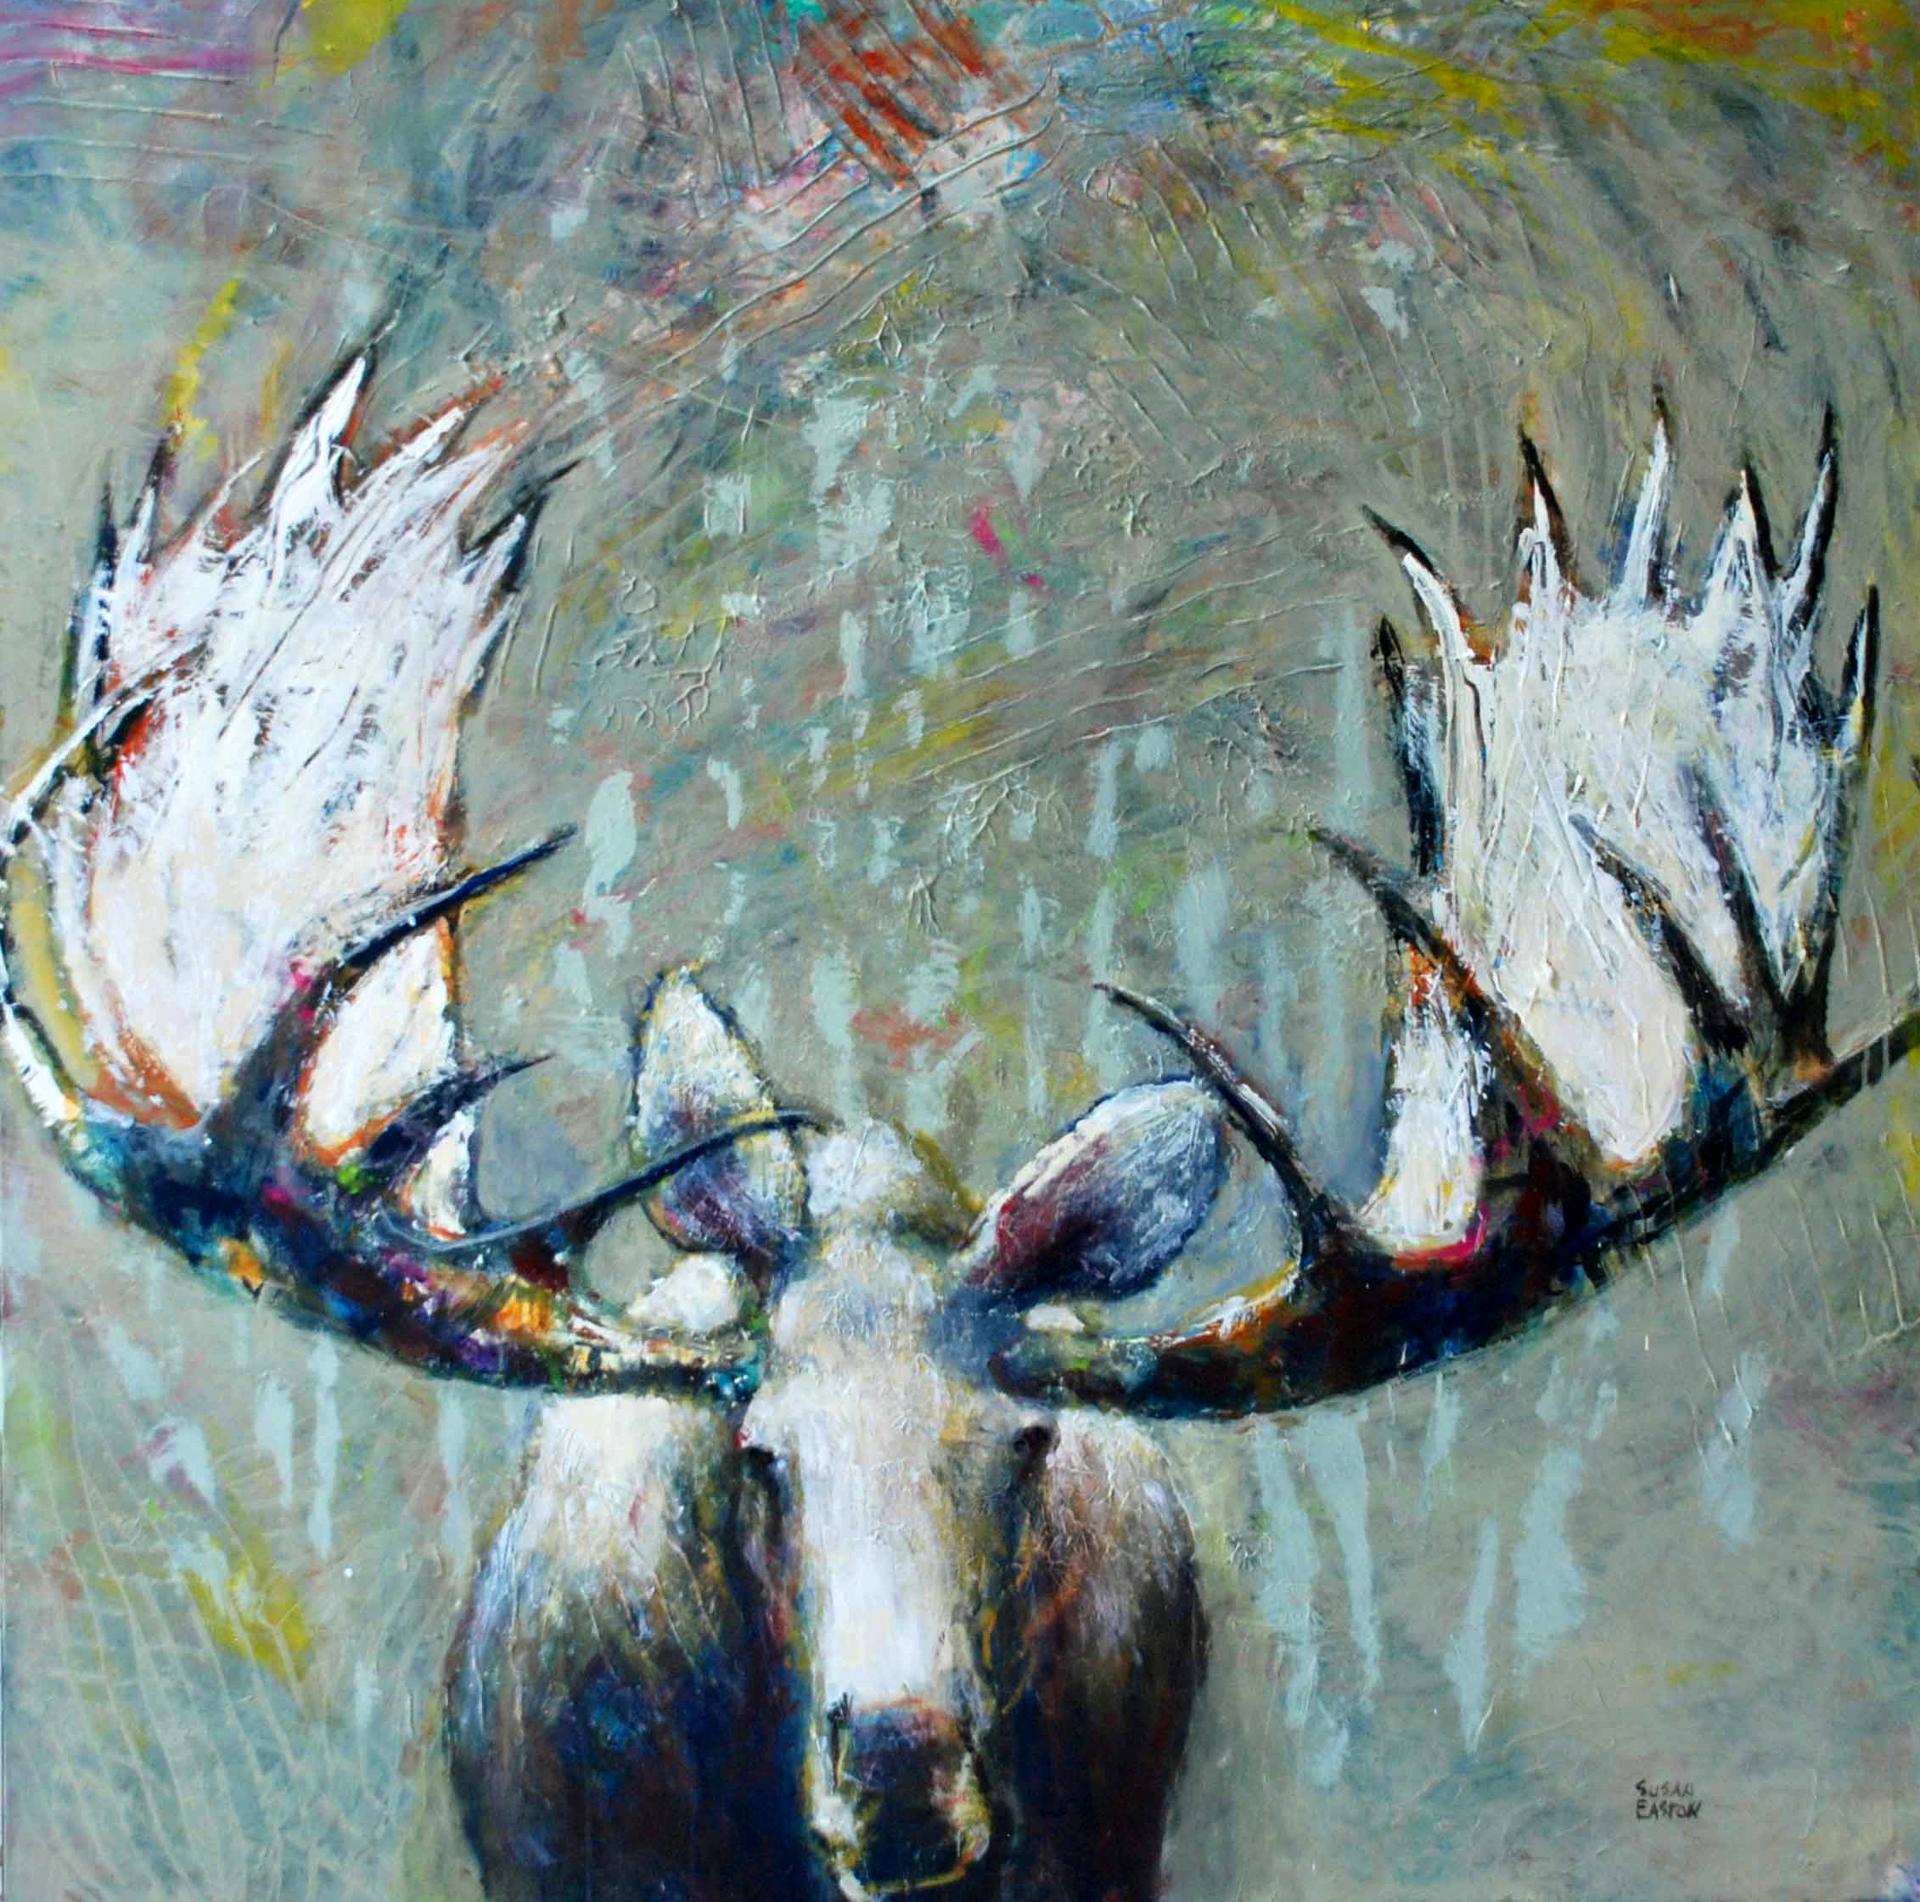 Solitare  by Susan Easton Burns